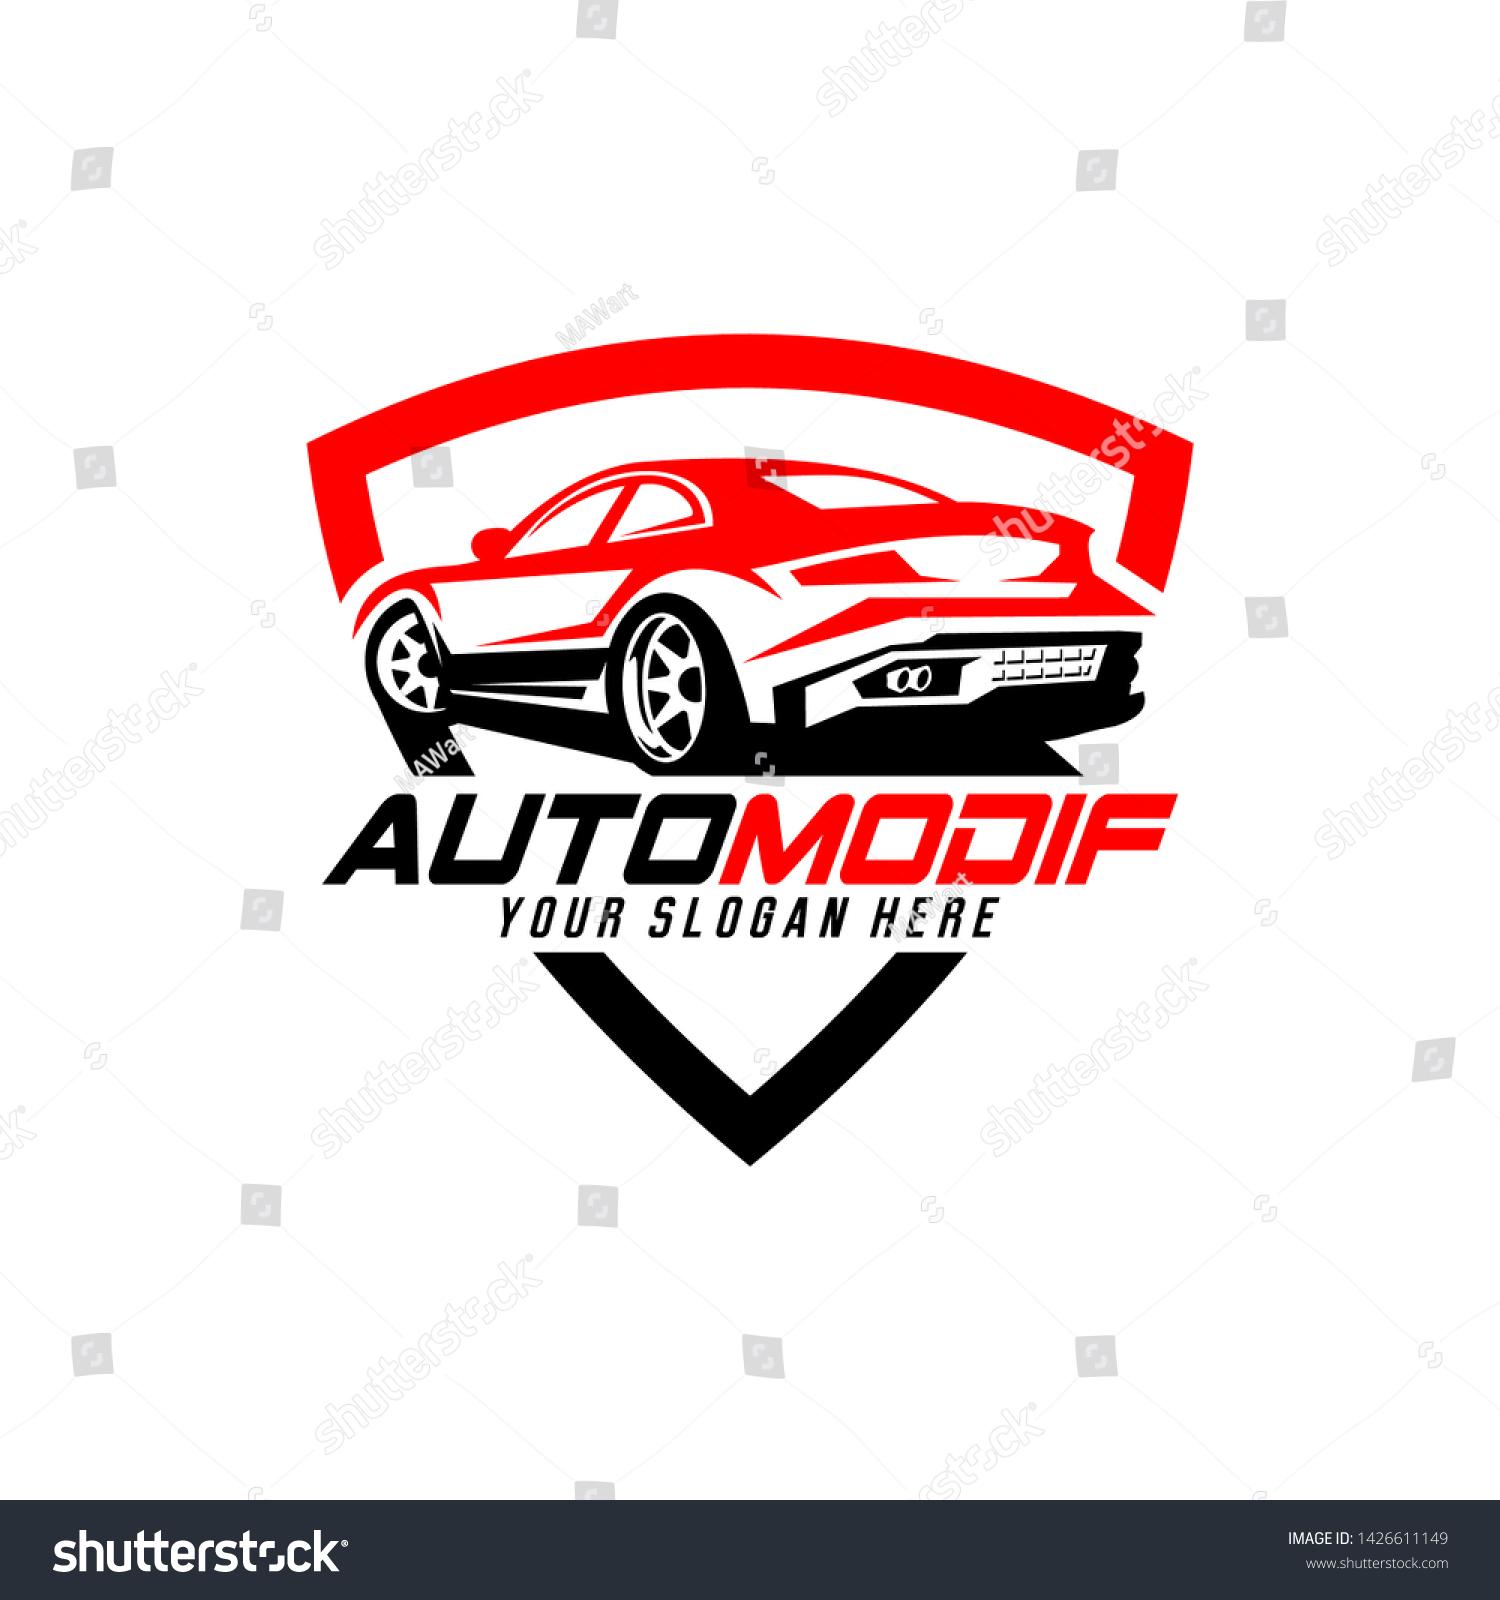 Automotive Logo Vector Car Detailing Garage Stock Vector Royalty Free 1426611149